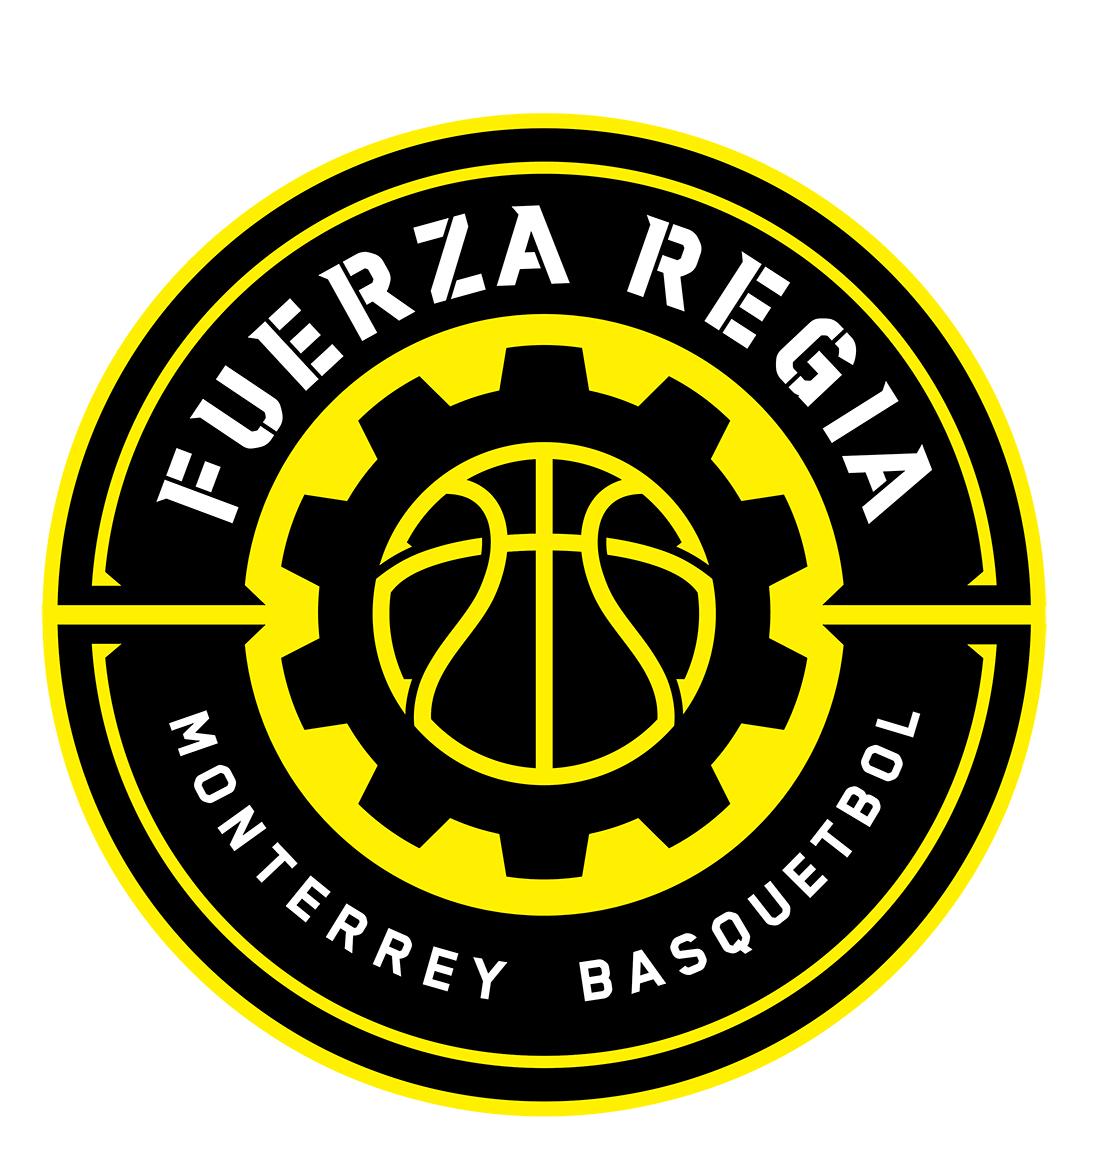 Logo fuerza regia de moterrey basquetbol